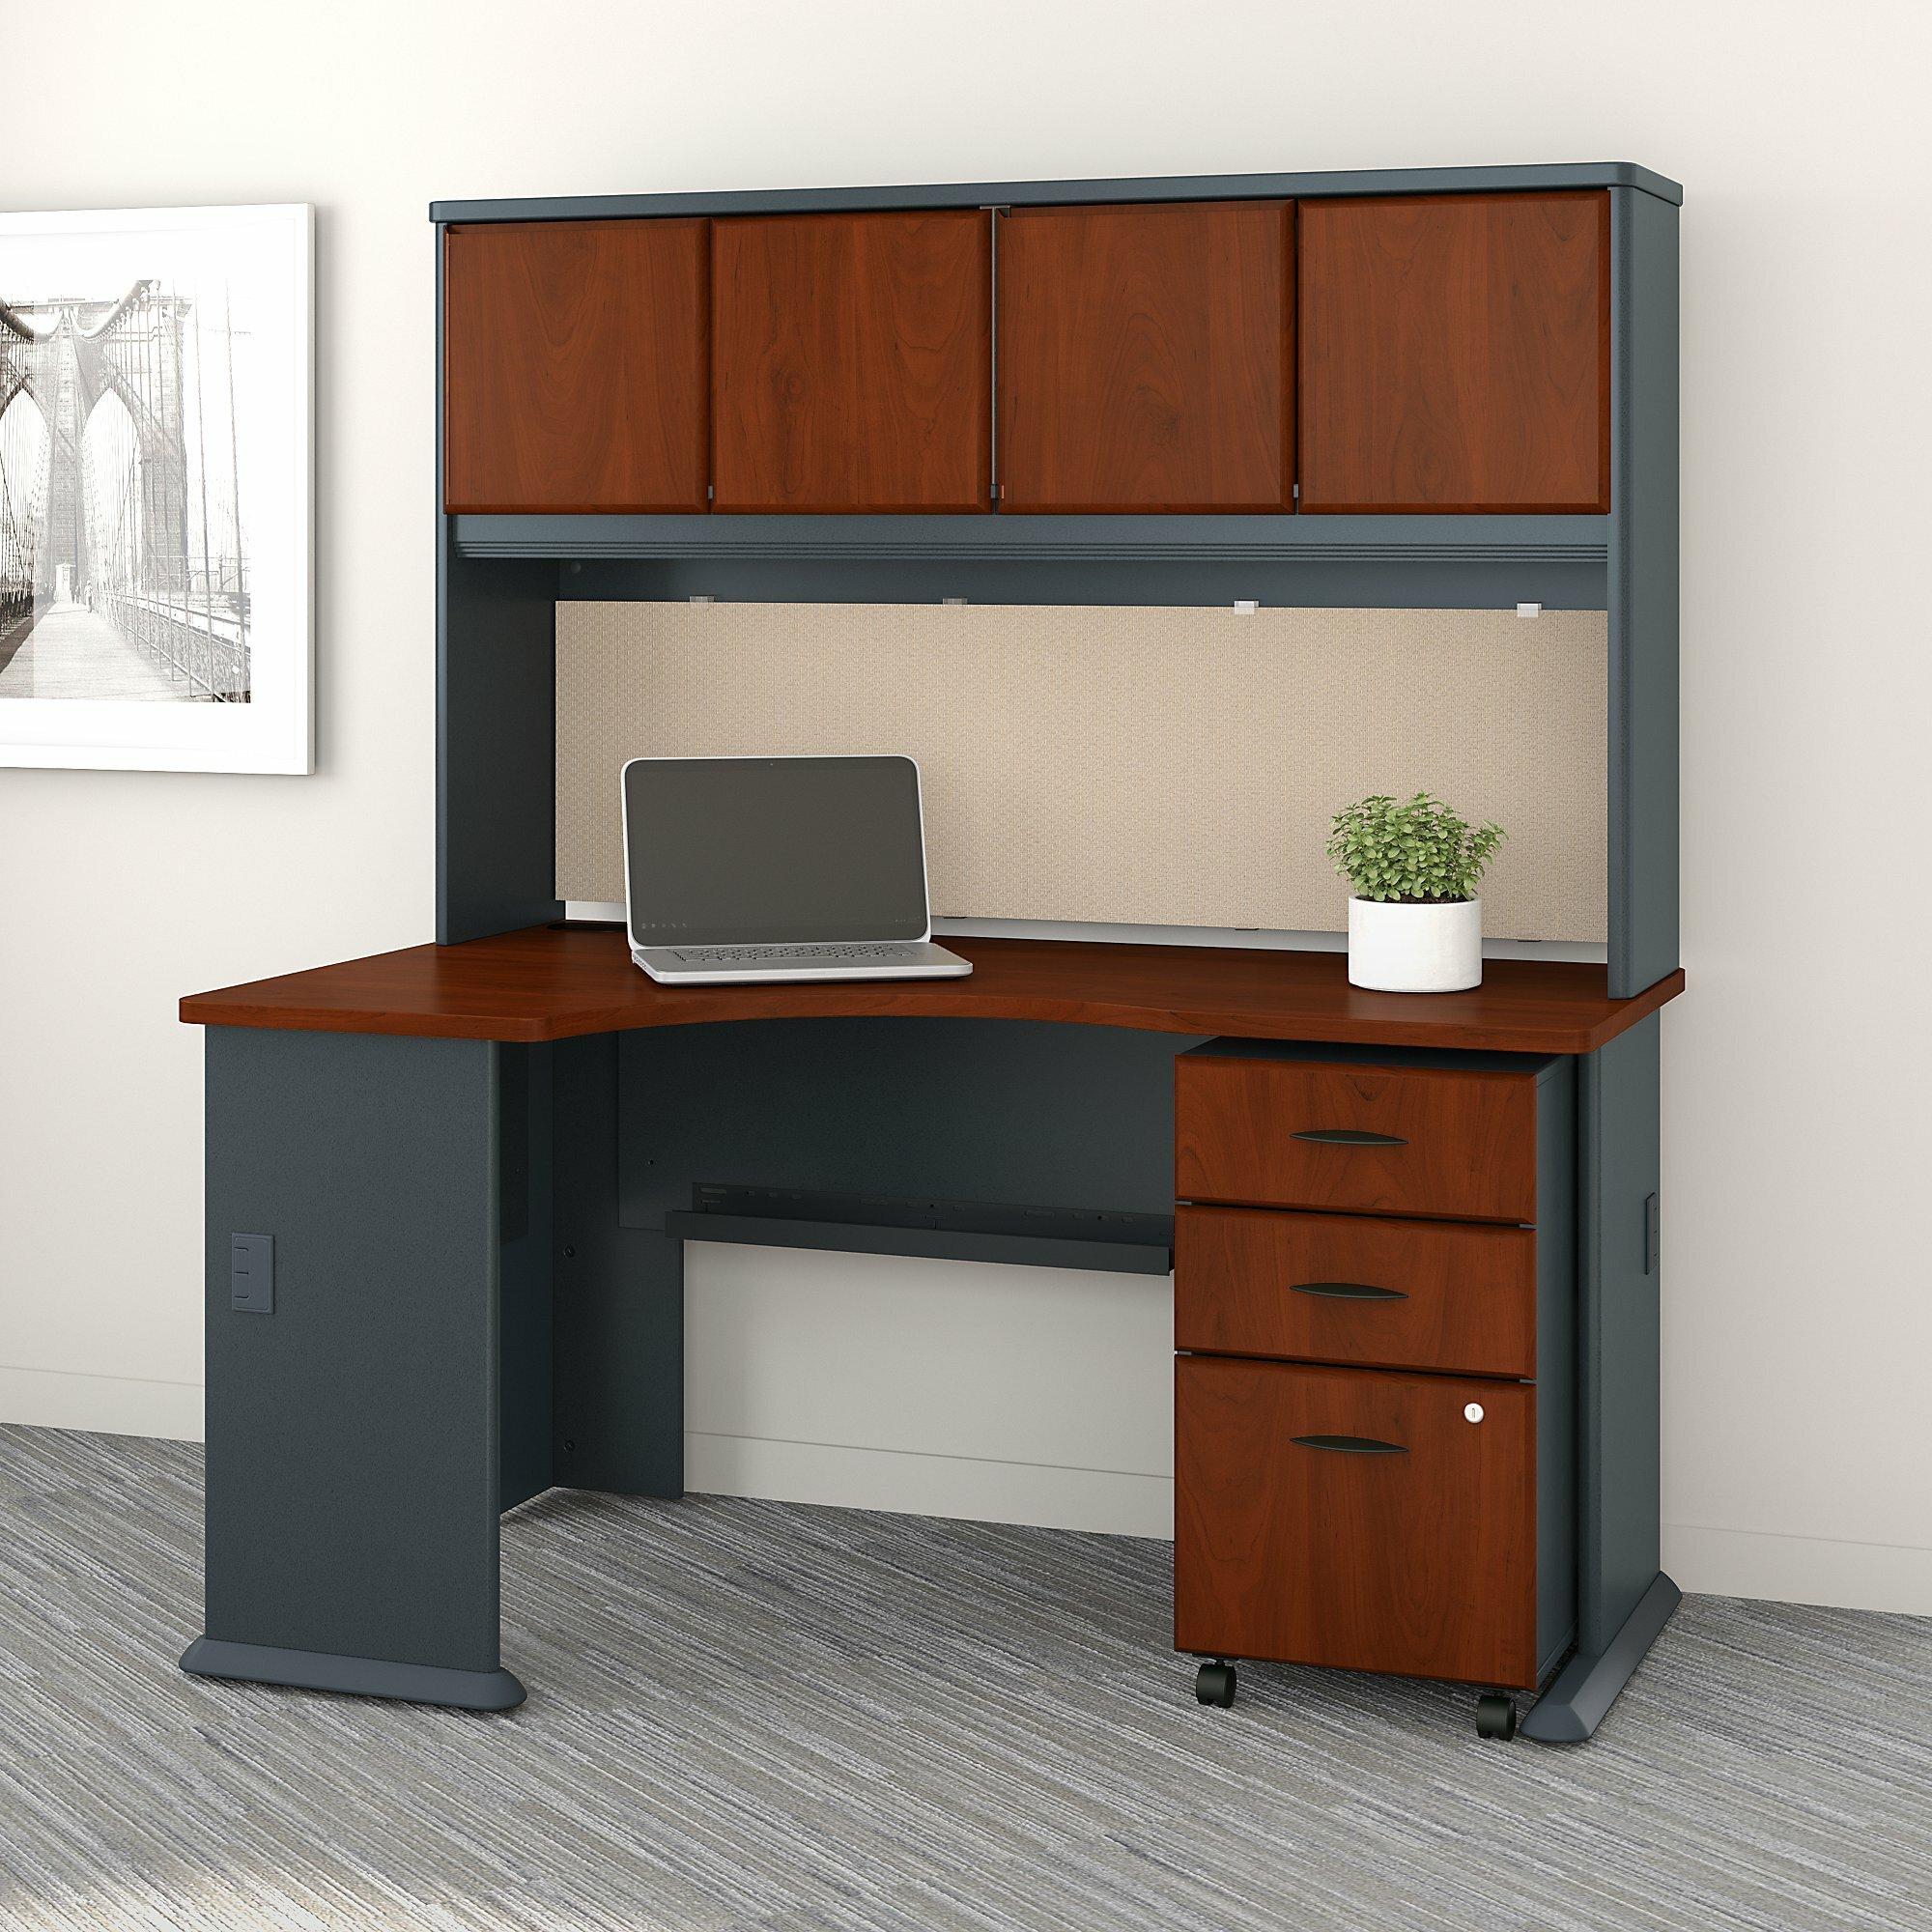 Furniture Series A 2 Piece Office Set